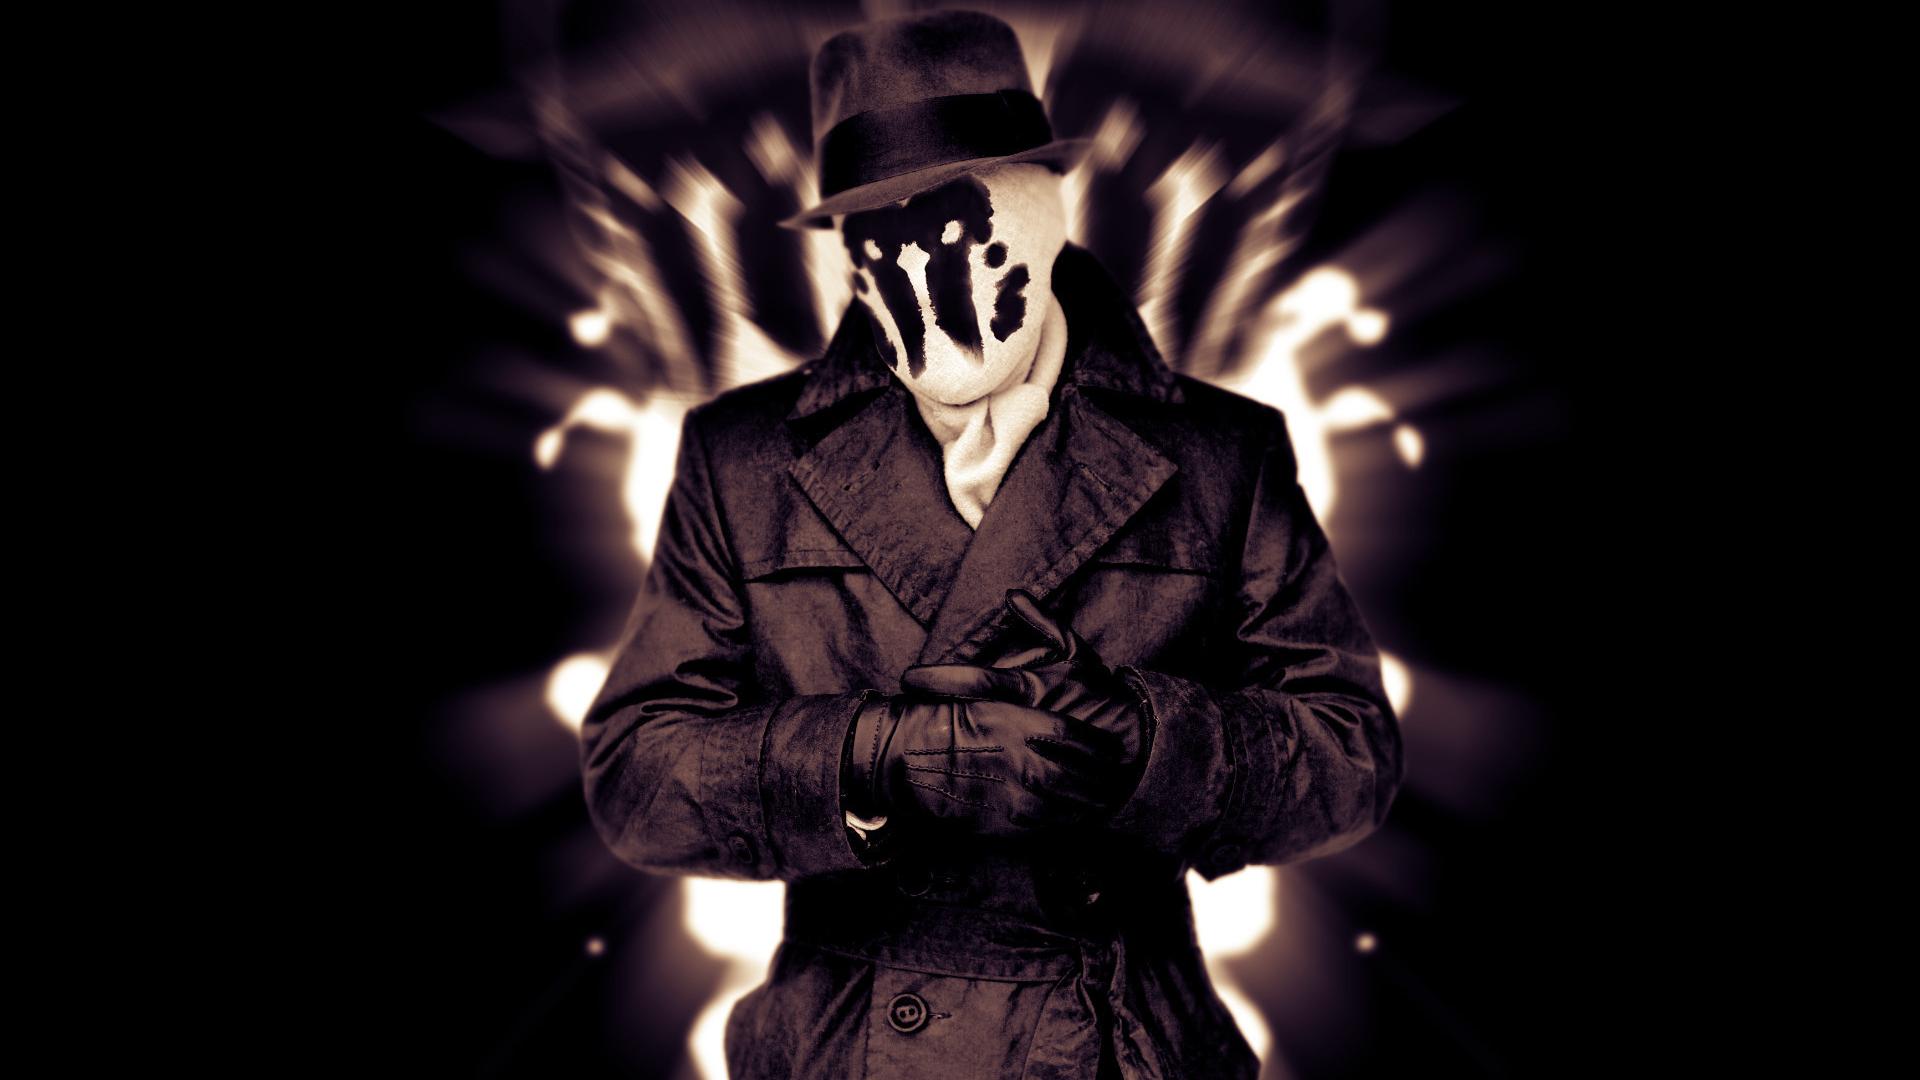 Free Download Rorschach Watchmen Wallpaper 20012390 1920x1200 For Your Desktop Mobile Tablet Explore 76 Watchmen Wallpapers Rorschach Wallpaper Watchmen Wallpaper Hd Watchmen Wallpaper Iphone